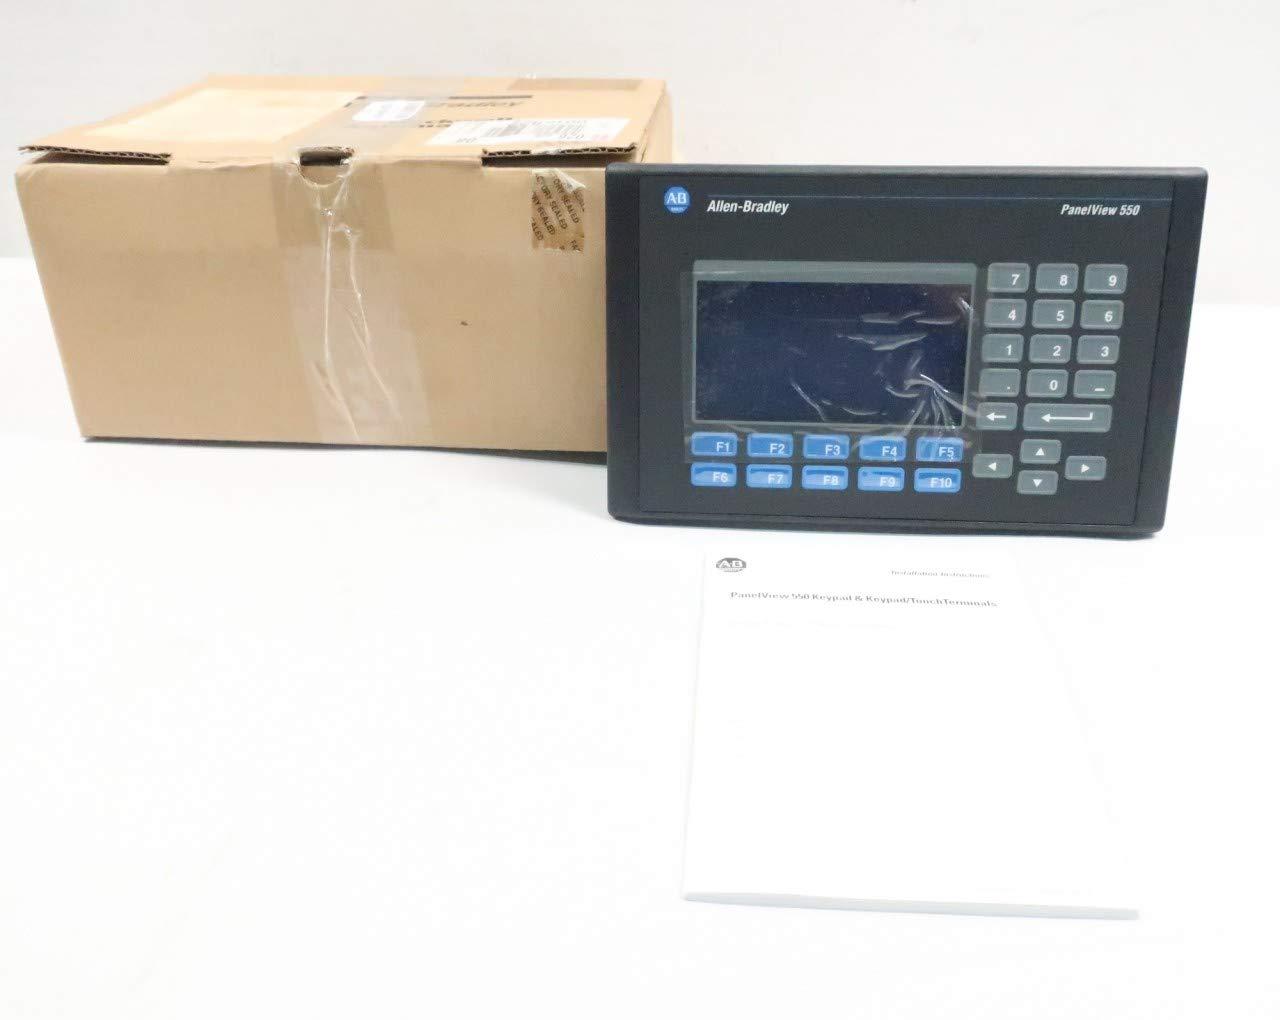 Allen Bradley 2711-K5A8L1 PANELVIEW 550 Interface Panel SER H Rev B D630202